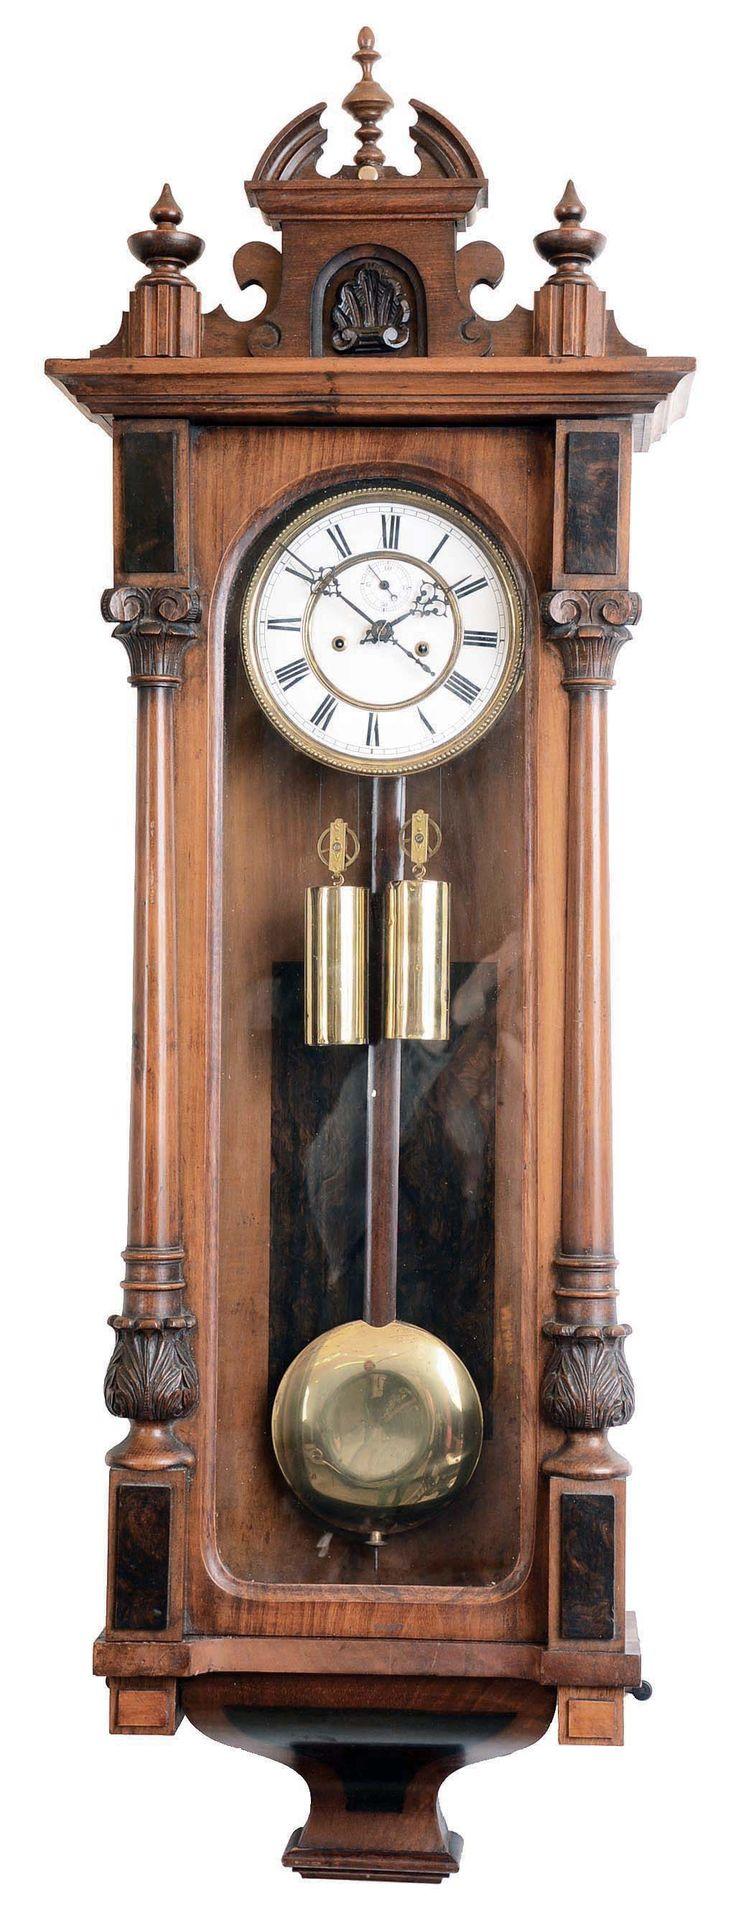 22 best kieninger clocks images on pinterest clock wall antique 14665ag obraz jpeg 1025 2687 pikseli skala 22 amipublicfo Images